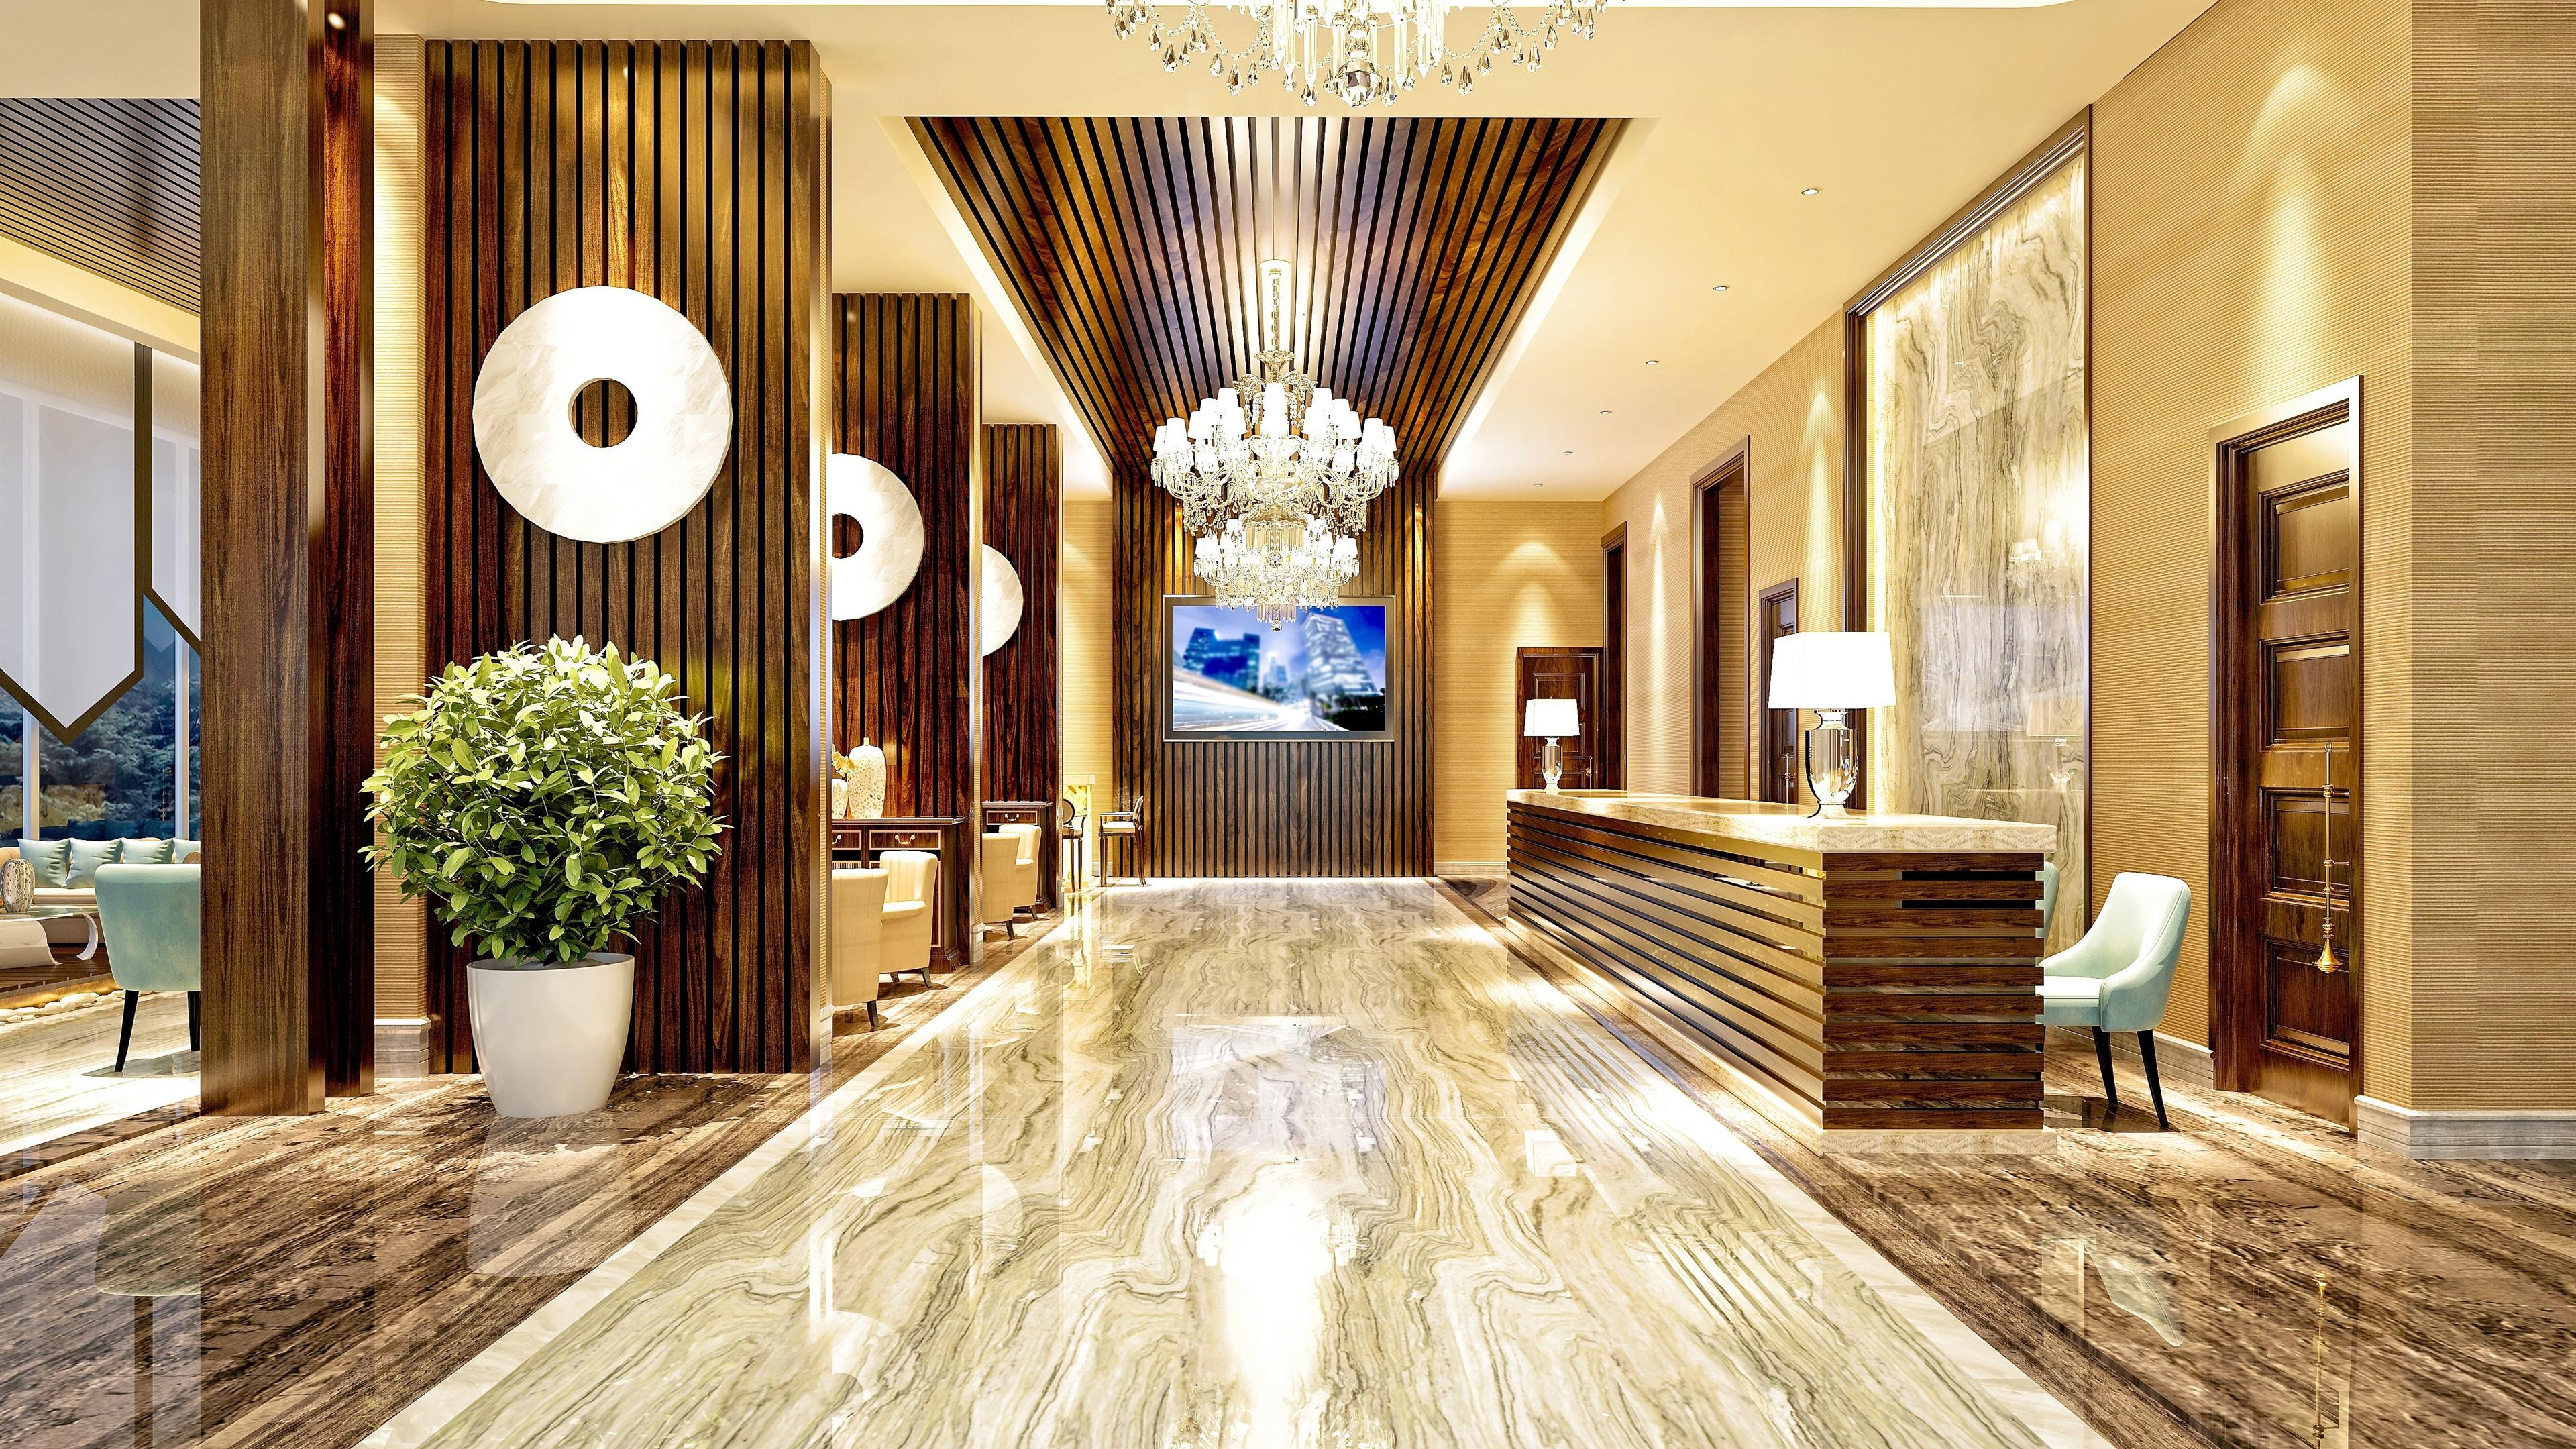 Wallpaper Hotel Hall Furniture Interior 3840x2160 Uhd 4k